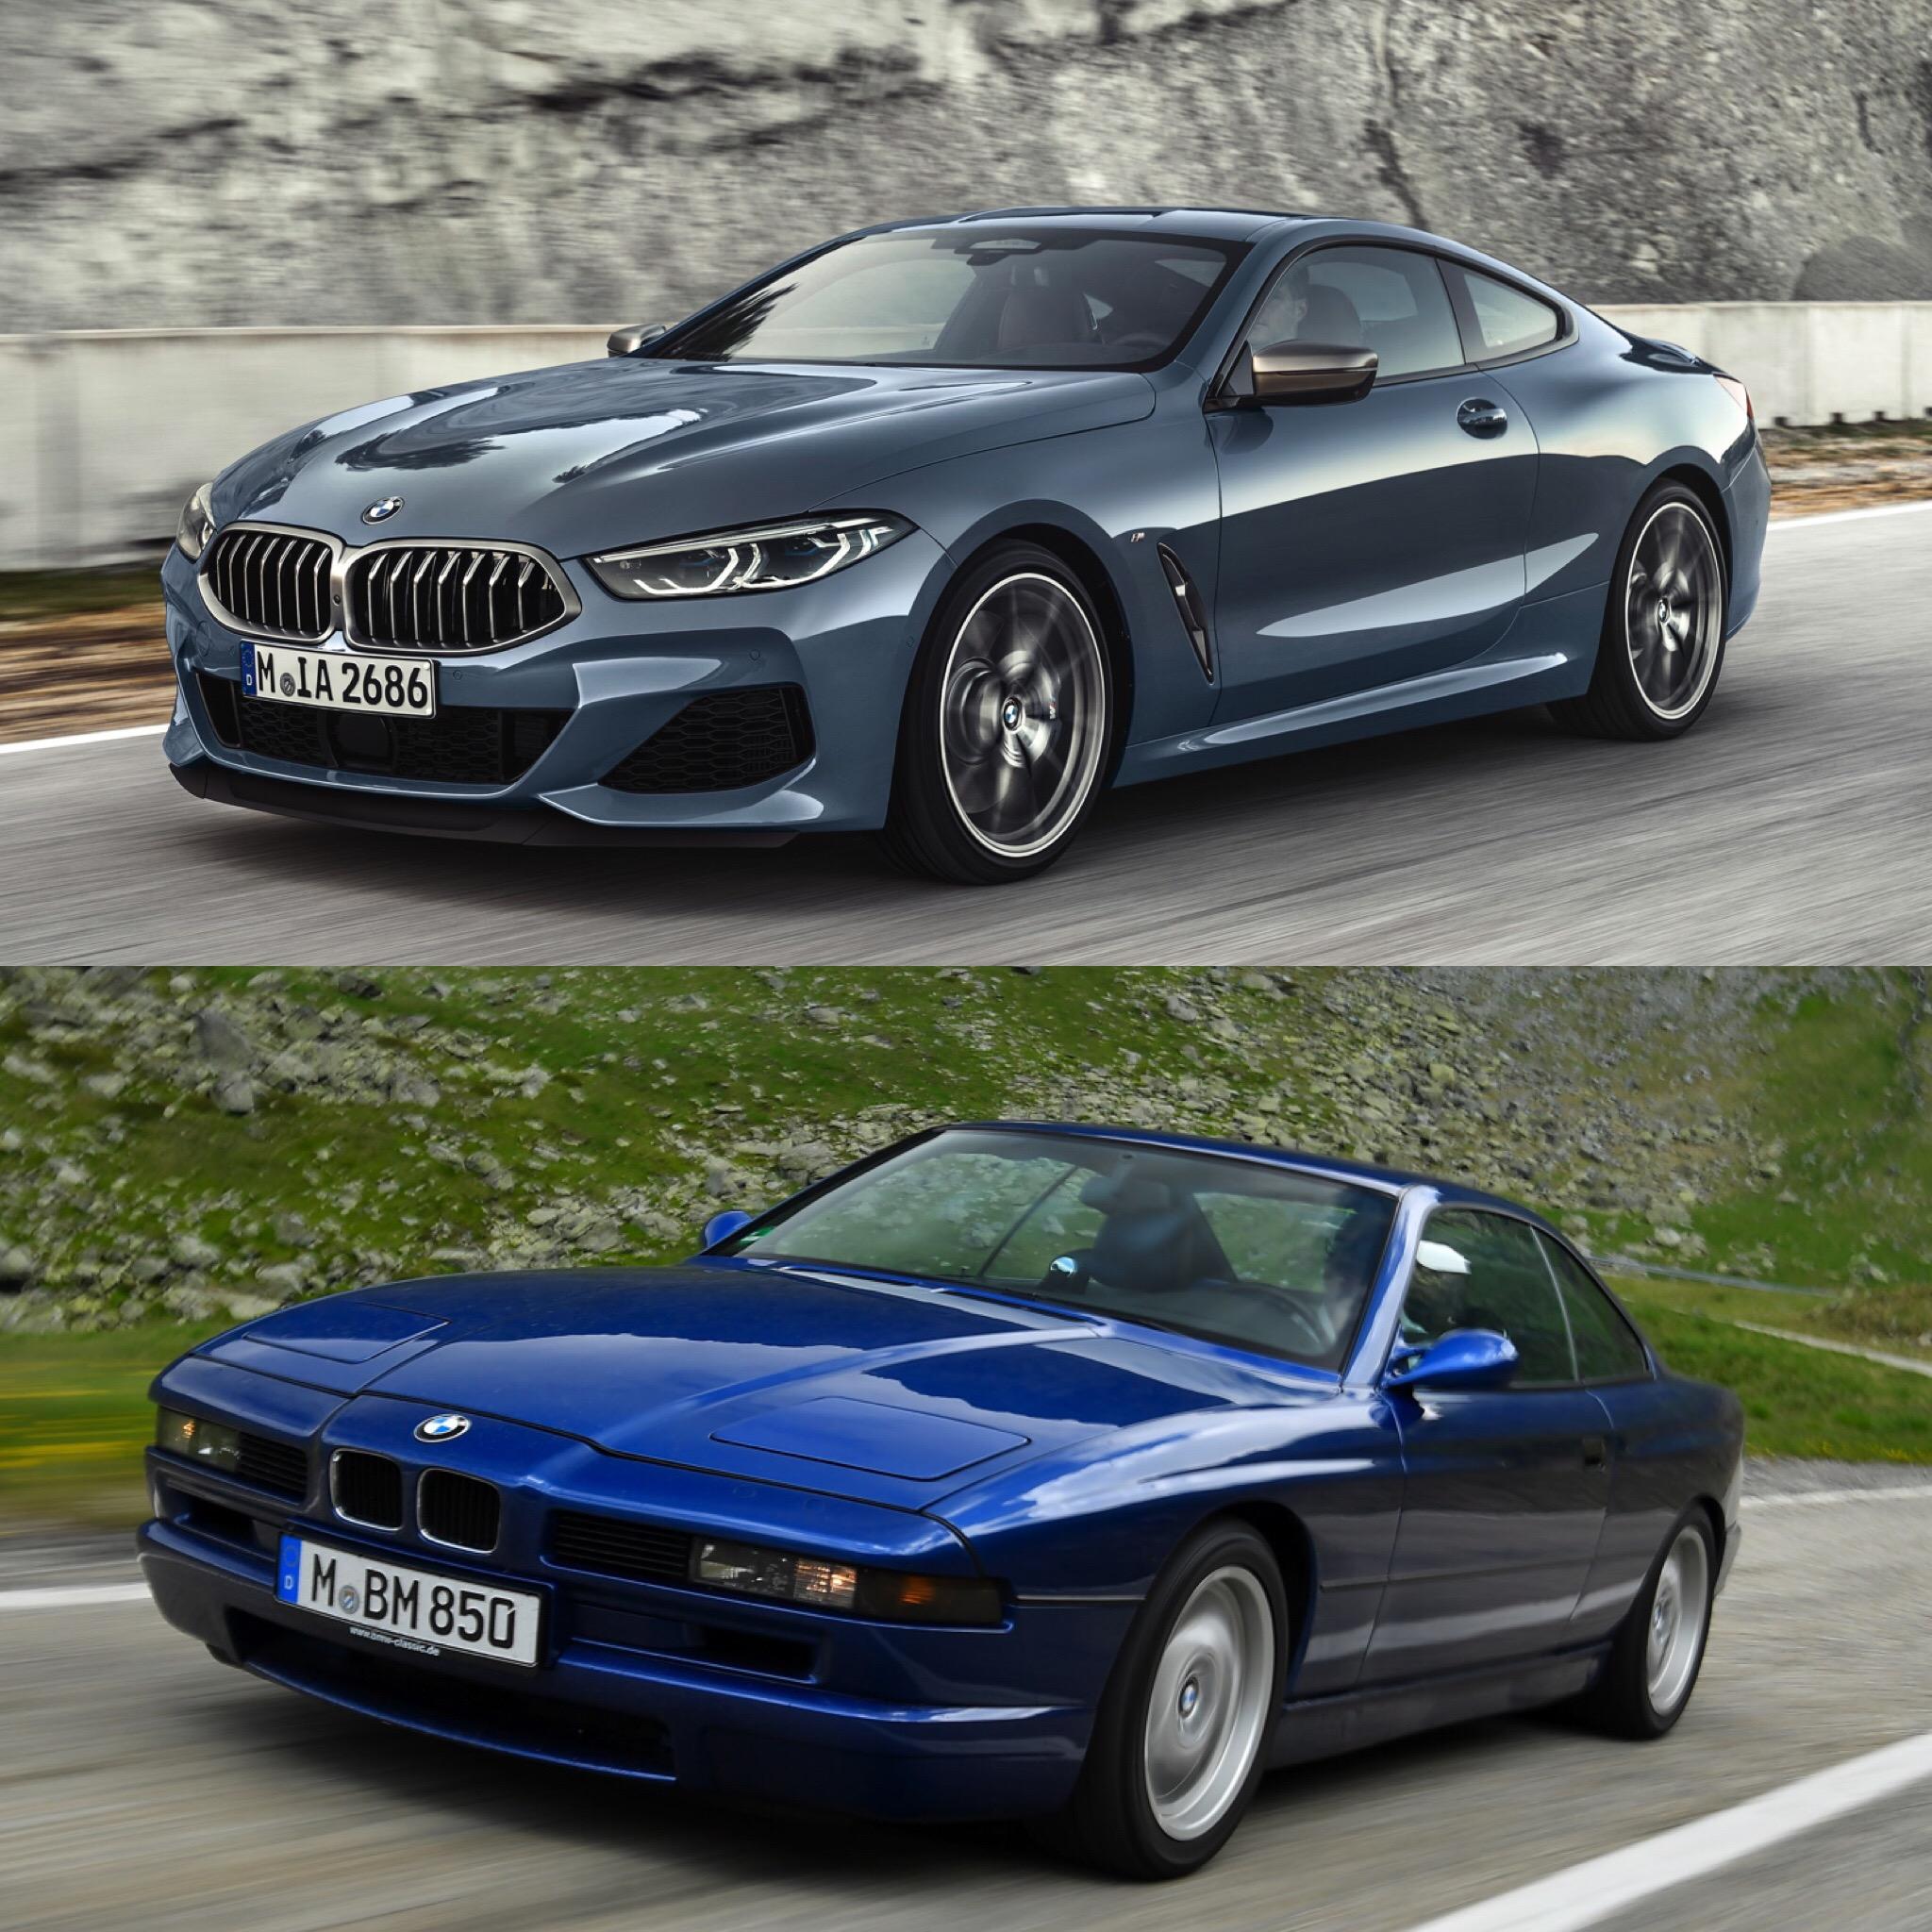 Bmw Z4 Old: Photo Comparison: Old BMW 8 Series Vs New BMW 8 Series